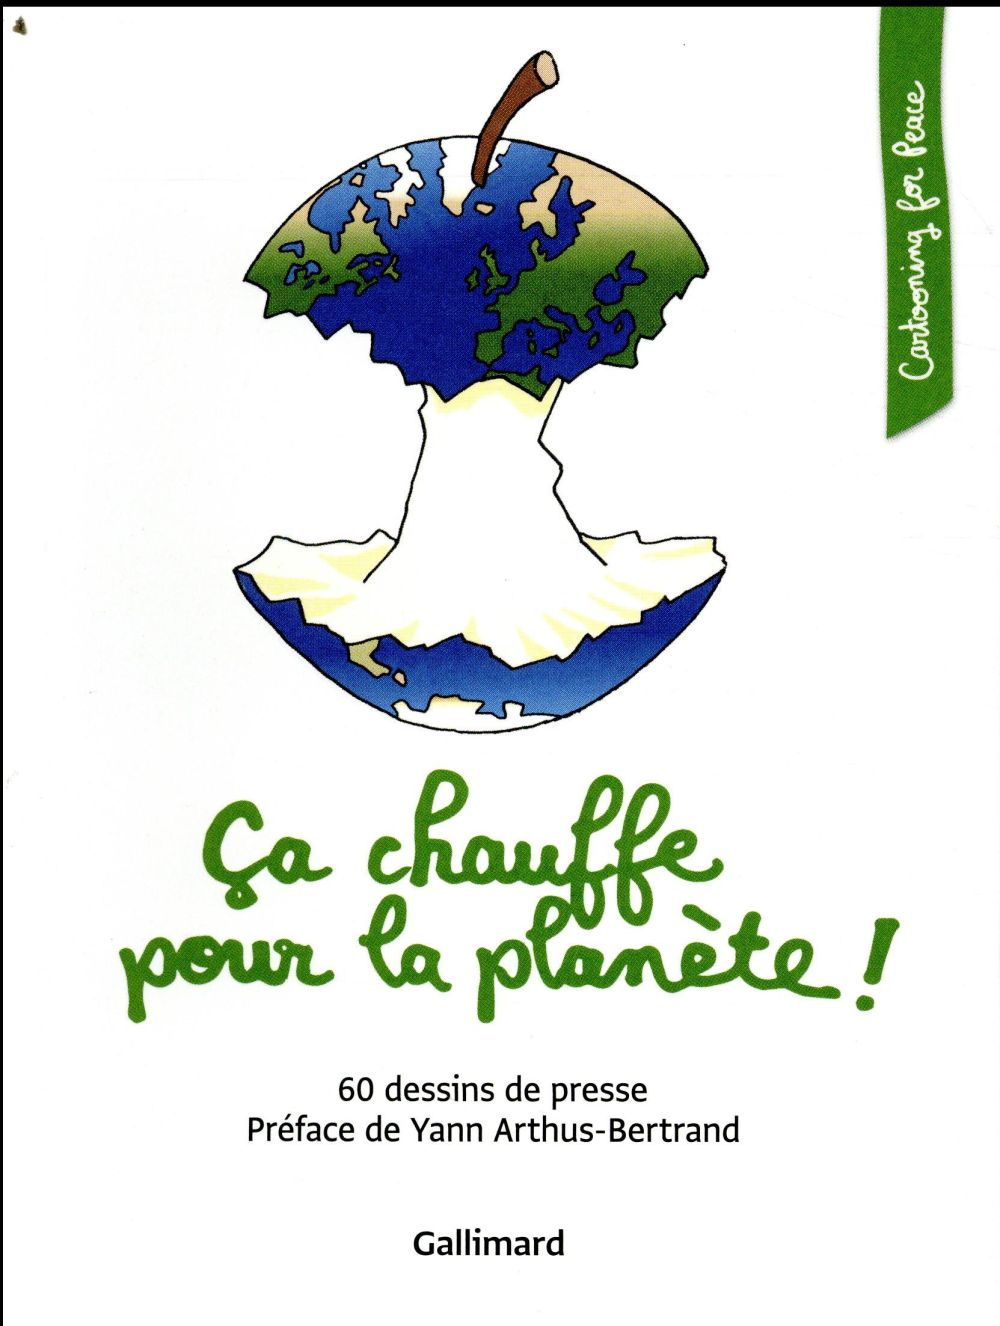 CA CHAUFFE POUR LA PLANETE ! COLLECTIF Gallimard-Loisirs